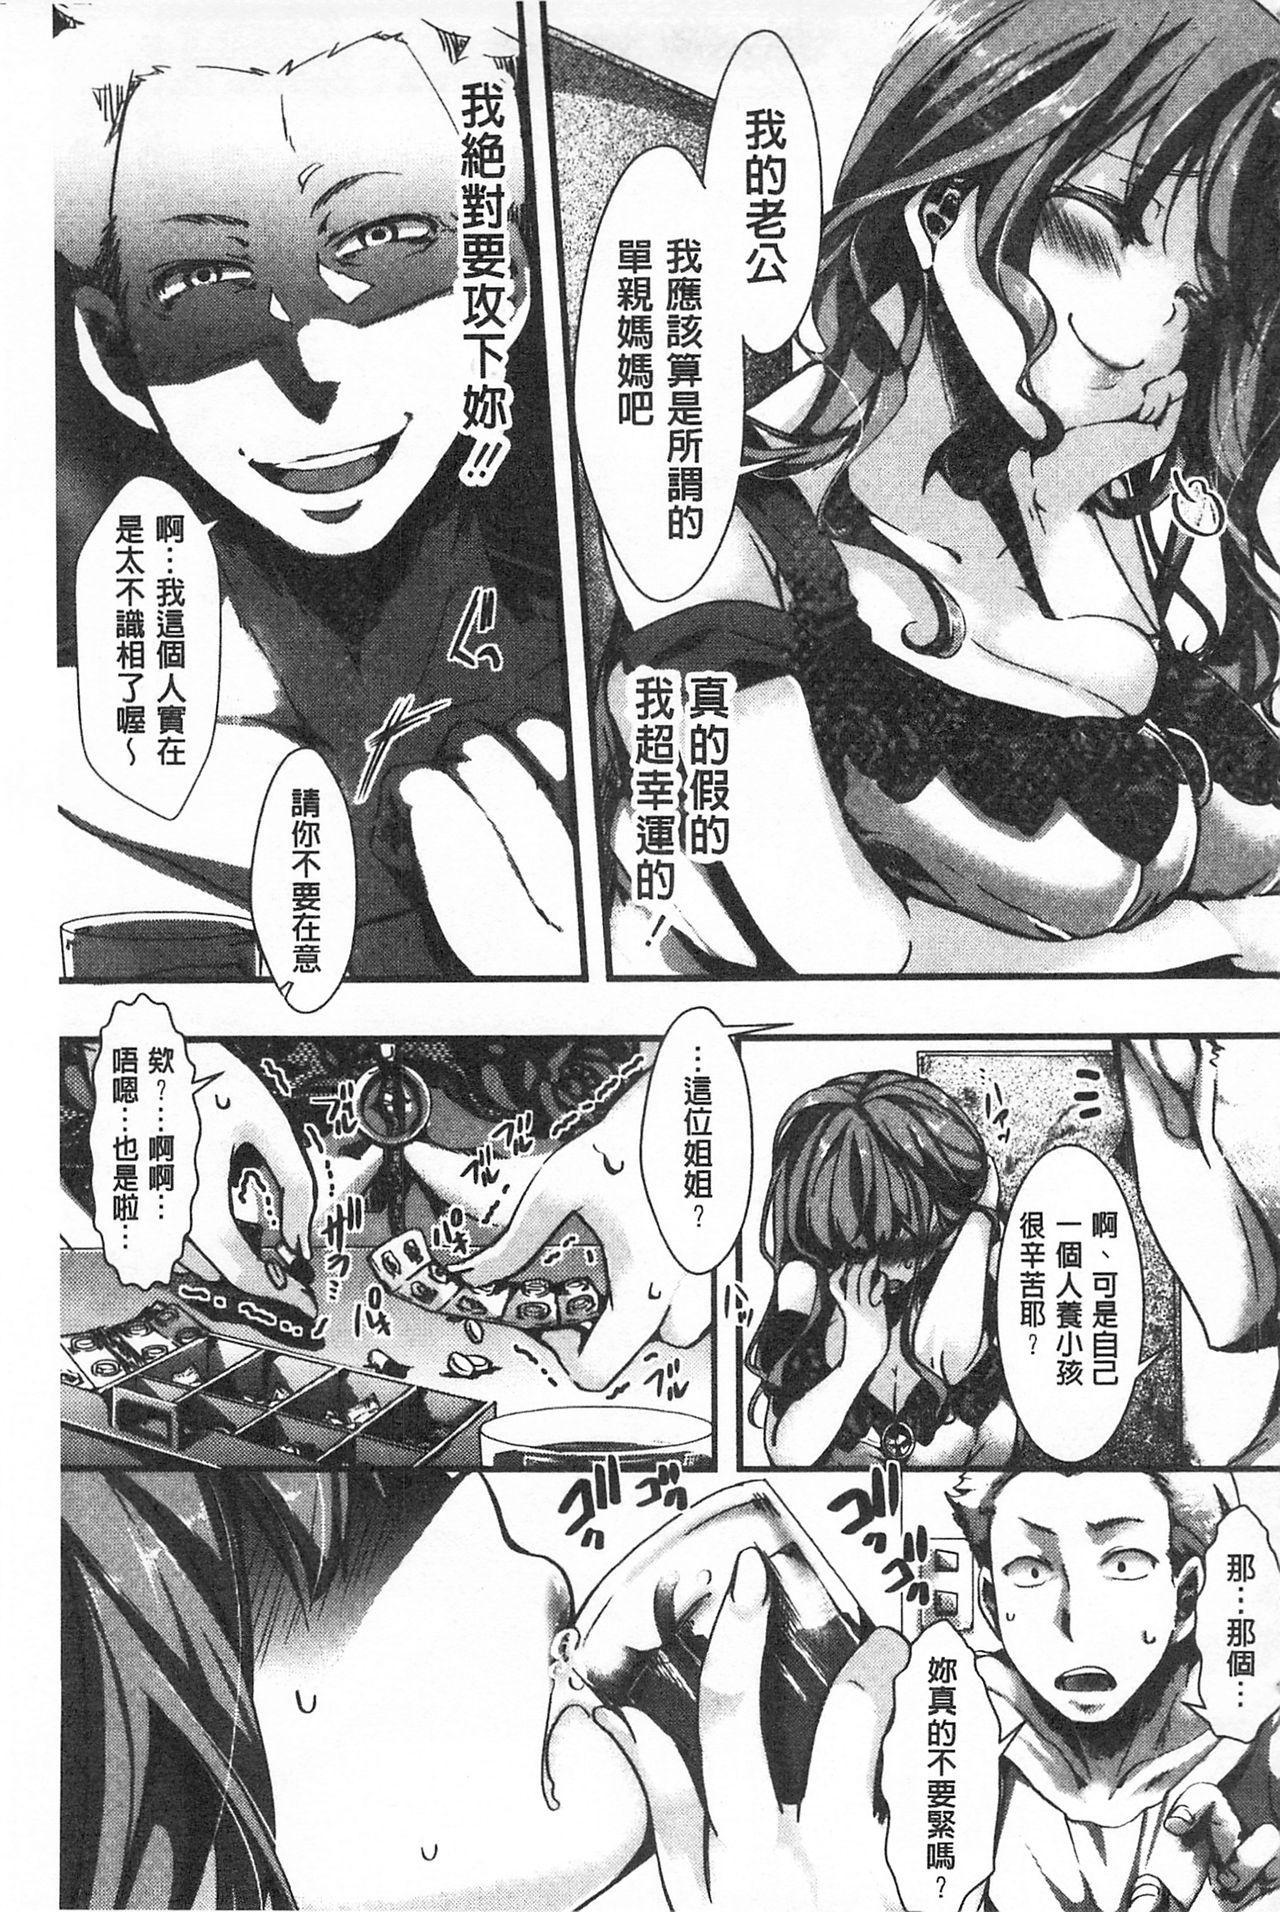 [hal] Daienjou -Ikare Ikasare Iki Ikare-   ∞艶嬢 -洩出來被搞到洩掛了被搞掛-  [Chinese] 34